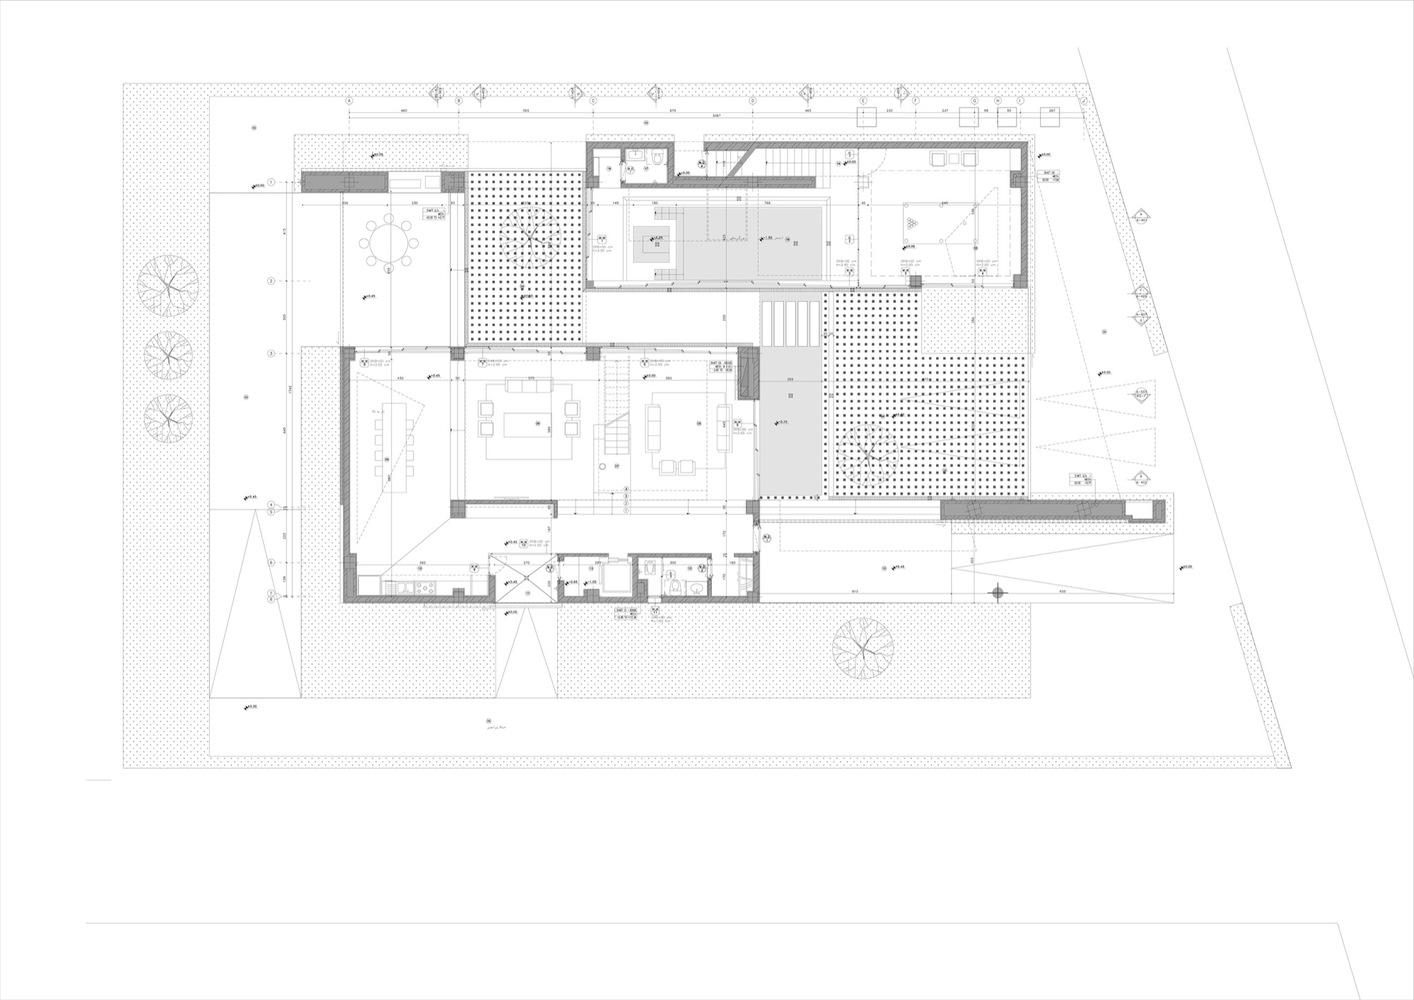 crane parts diagram honeywell s8610u wiring yard house overhead free for you u2022 rh six ineedmorespace co creator